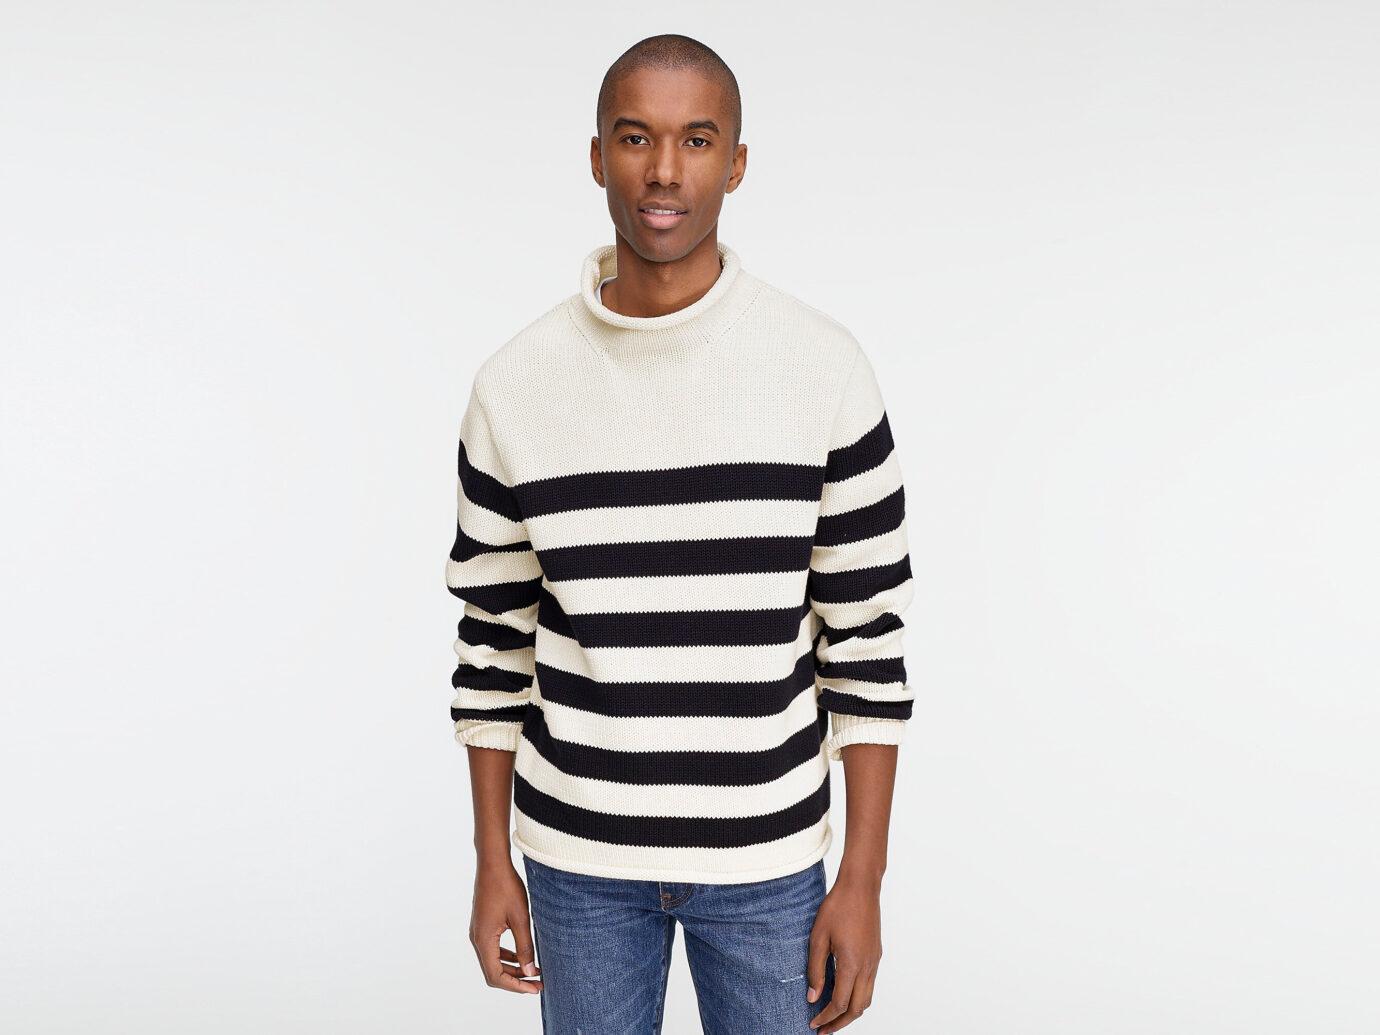 J.Crew 1988 Cotton Rollneck Sweater